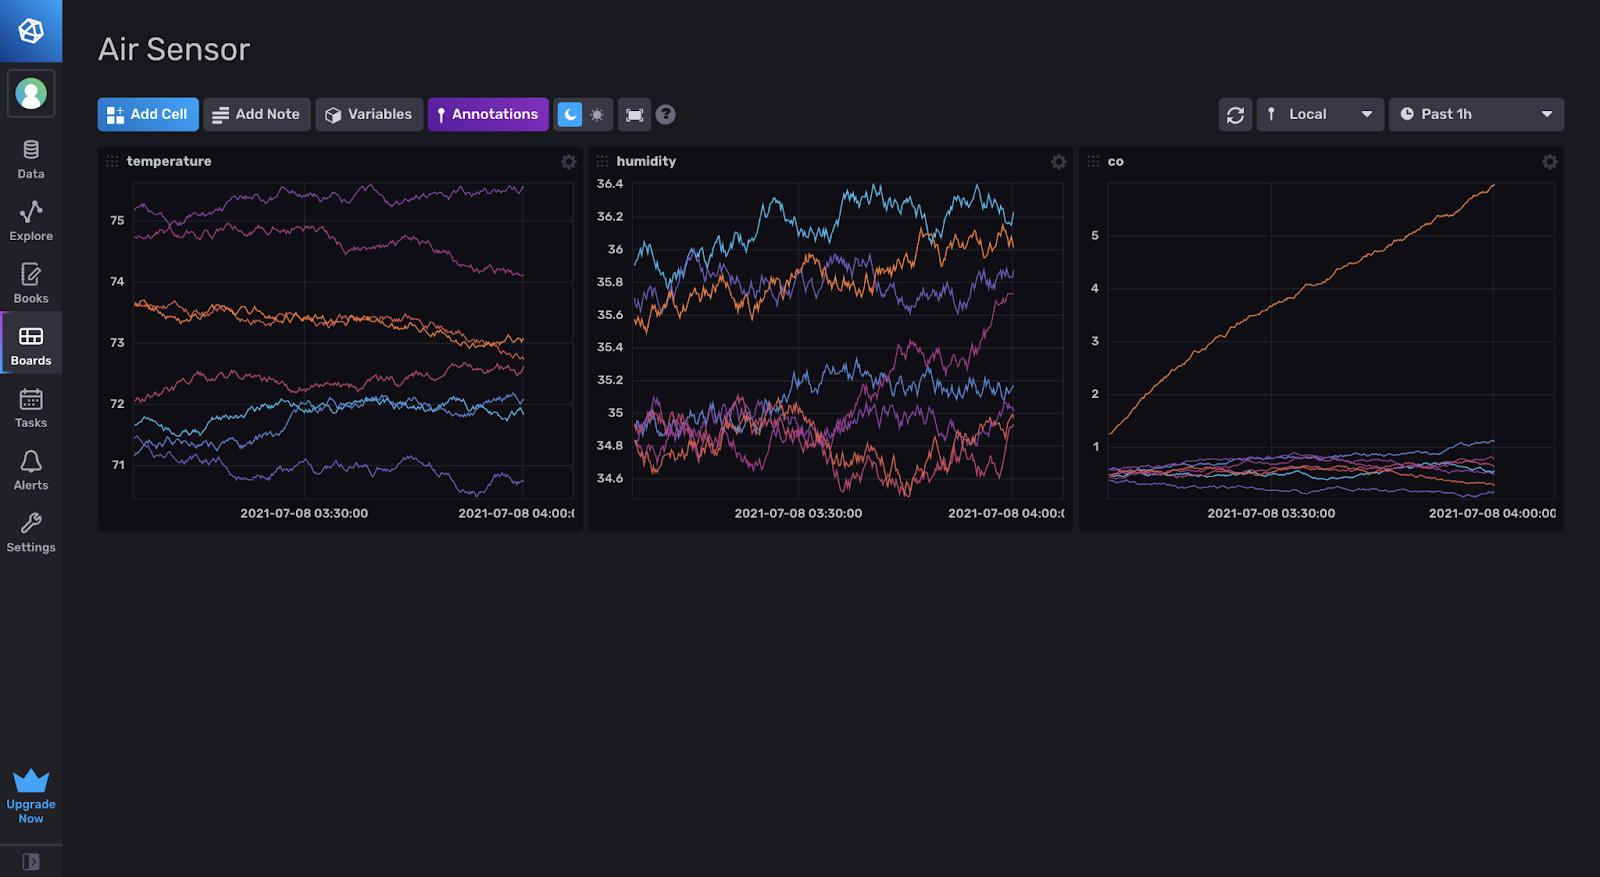 InfluxDB - creating a dashboard